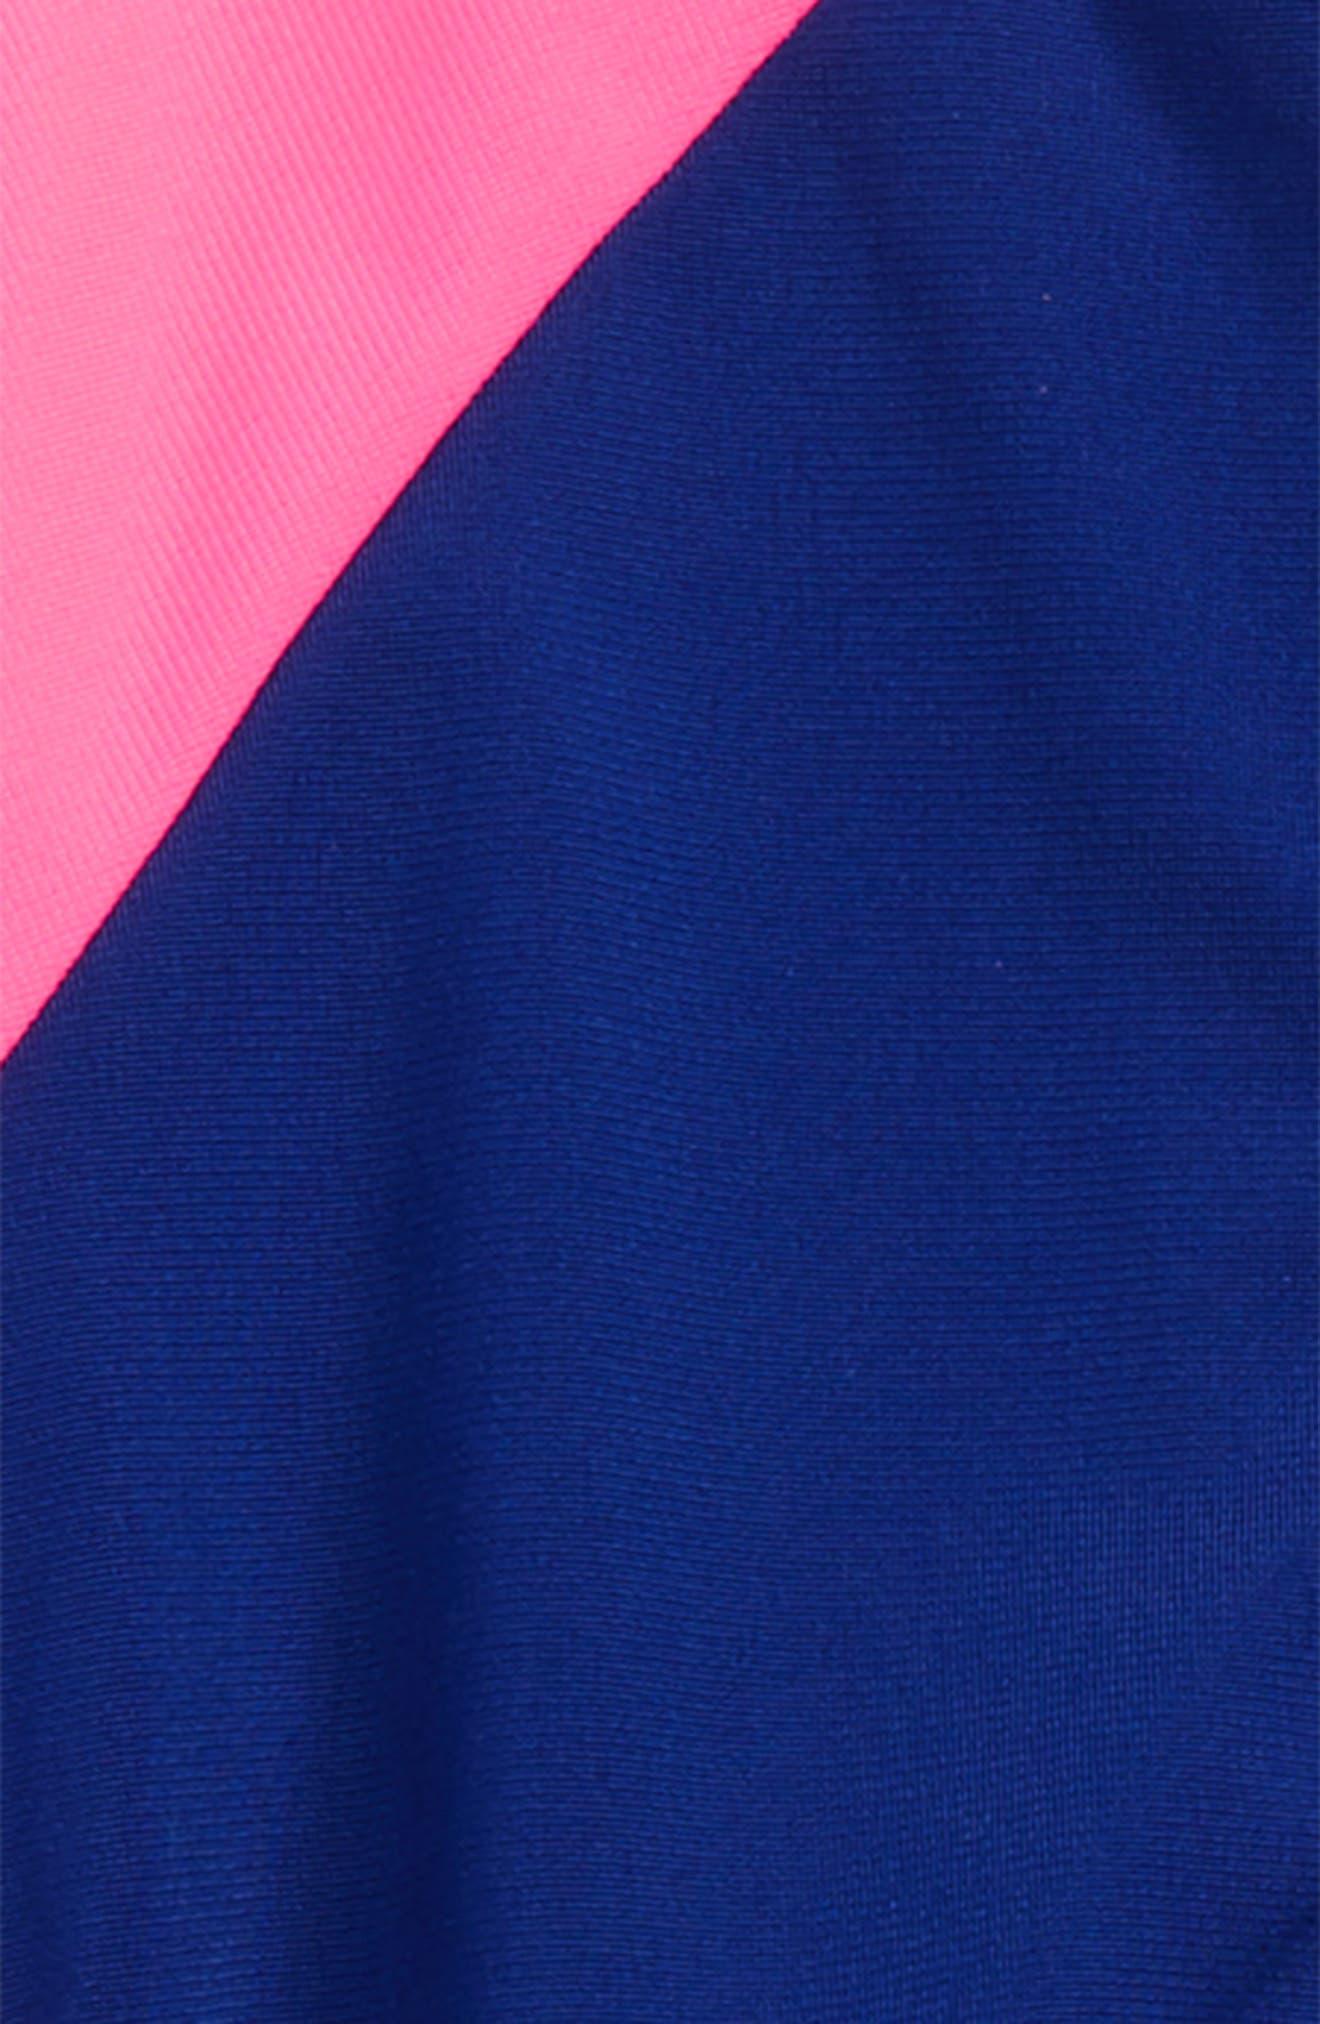 EQT Track Jacket & Pants,                             Alternate thumbnail 2, color,                             Mystery Ink/ Solar Pink